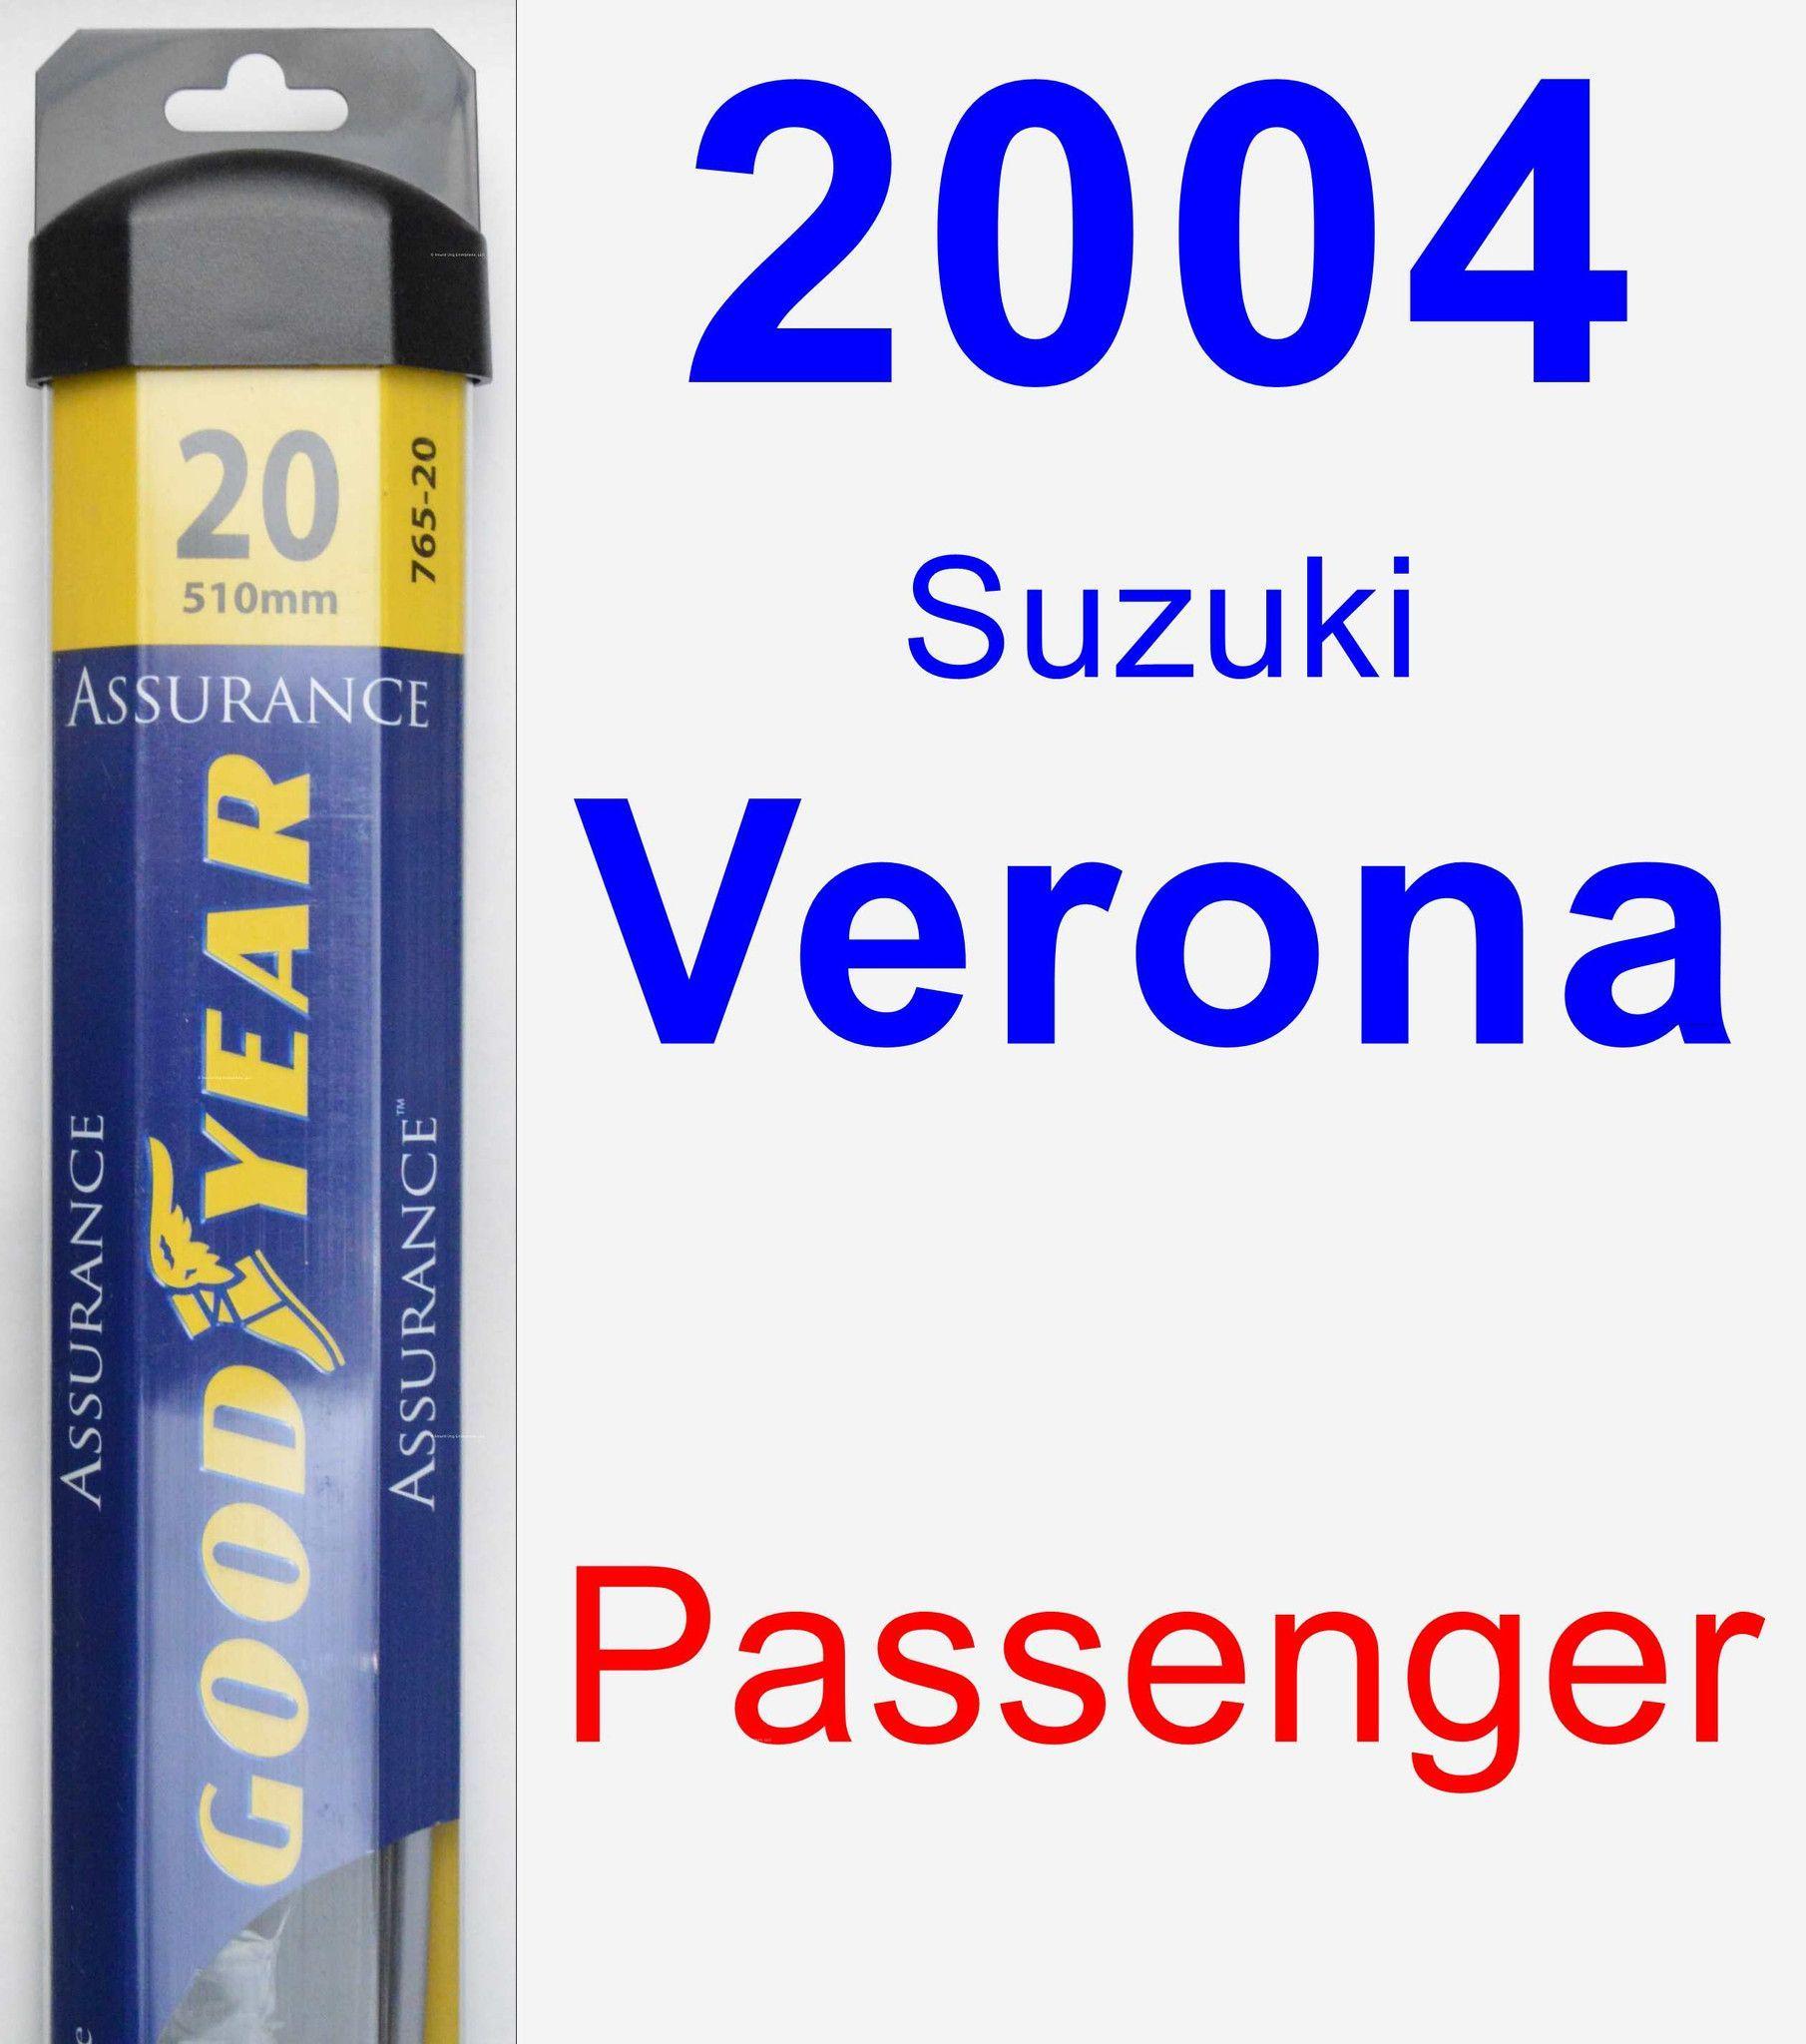 Passenger Wiper Blade for 2004 Suzuki Verona Assurance